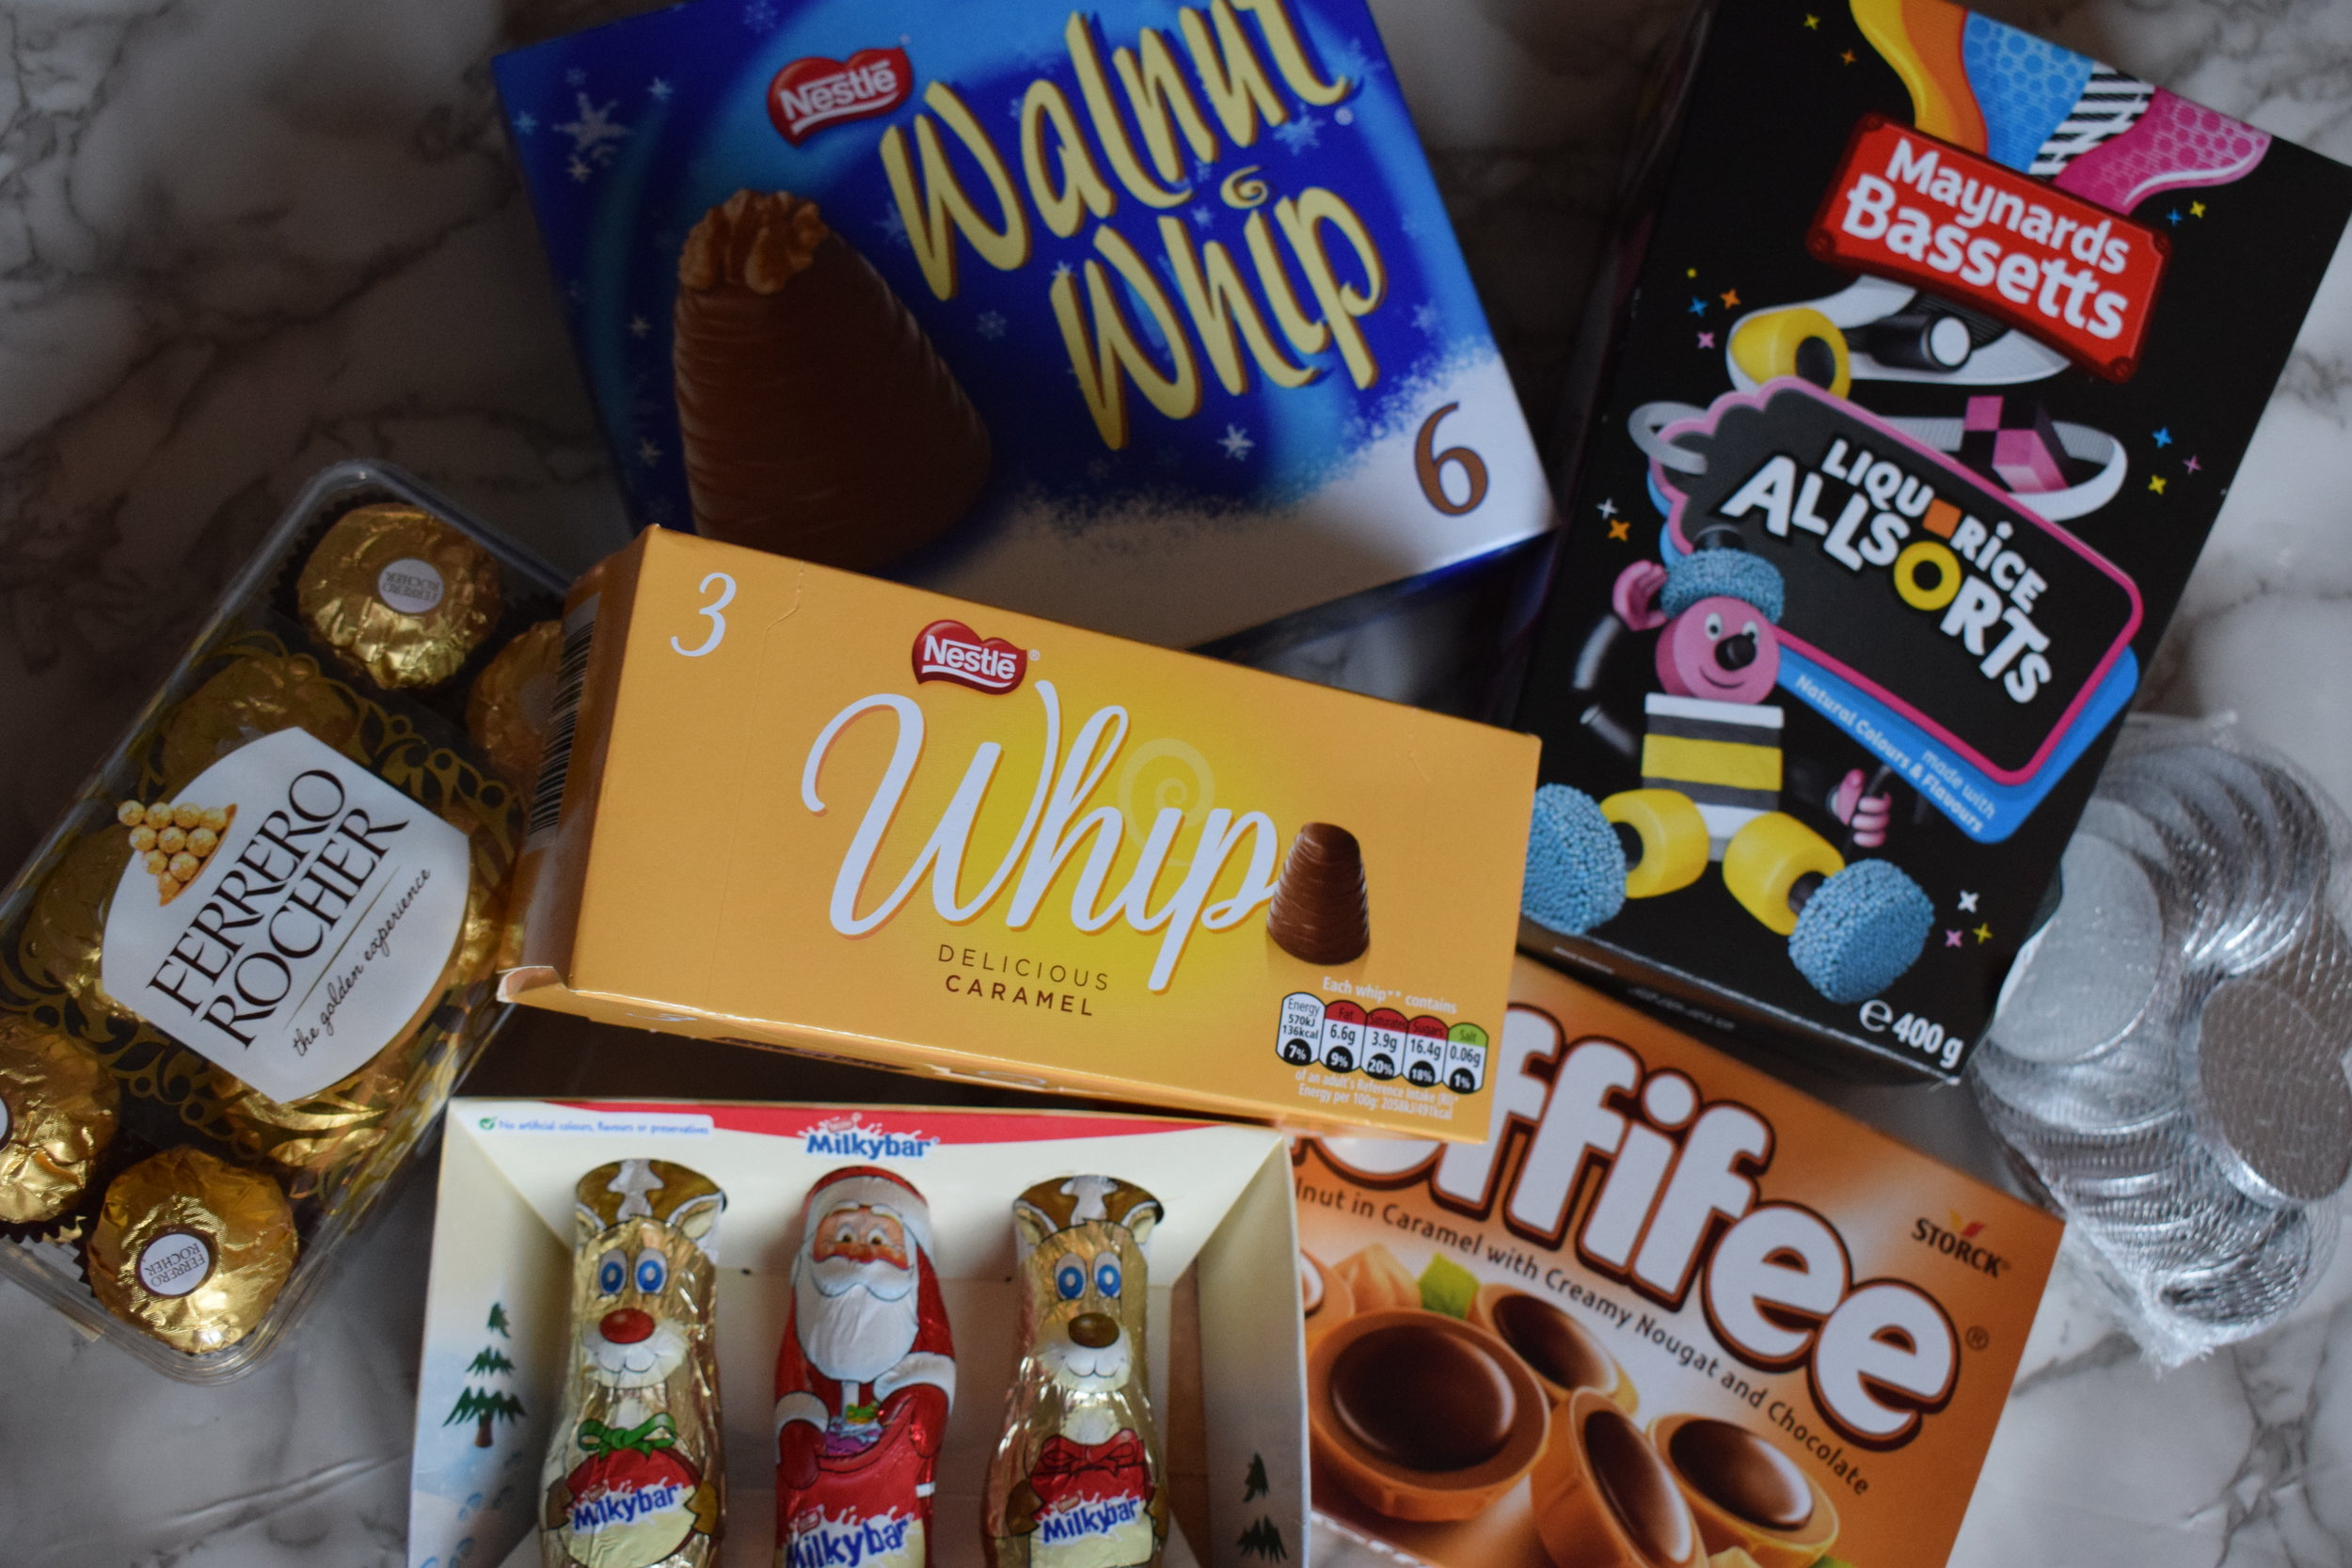 sweet treats ferrero rocher nestle walnut whip milkybar toffifee maynards bassetts liquorice allsorts white chocolate coins